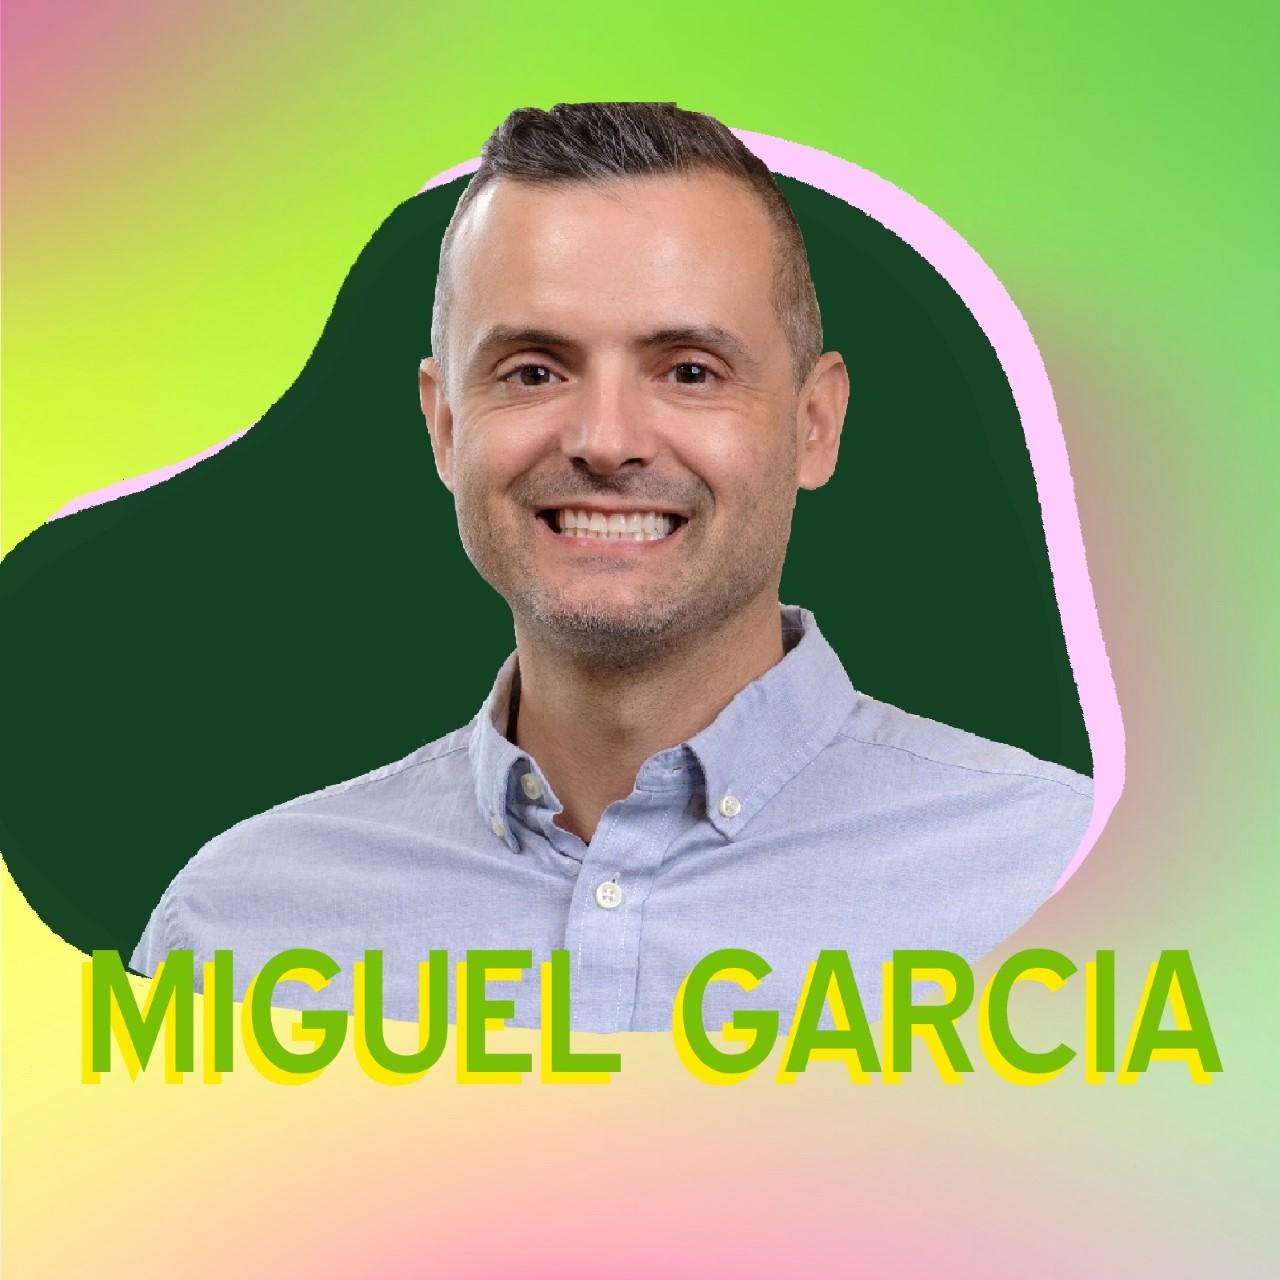 """Miguel Garcia"" superimposed over his headshot"